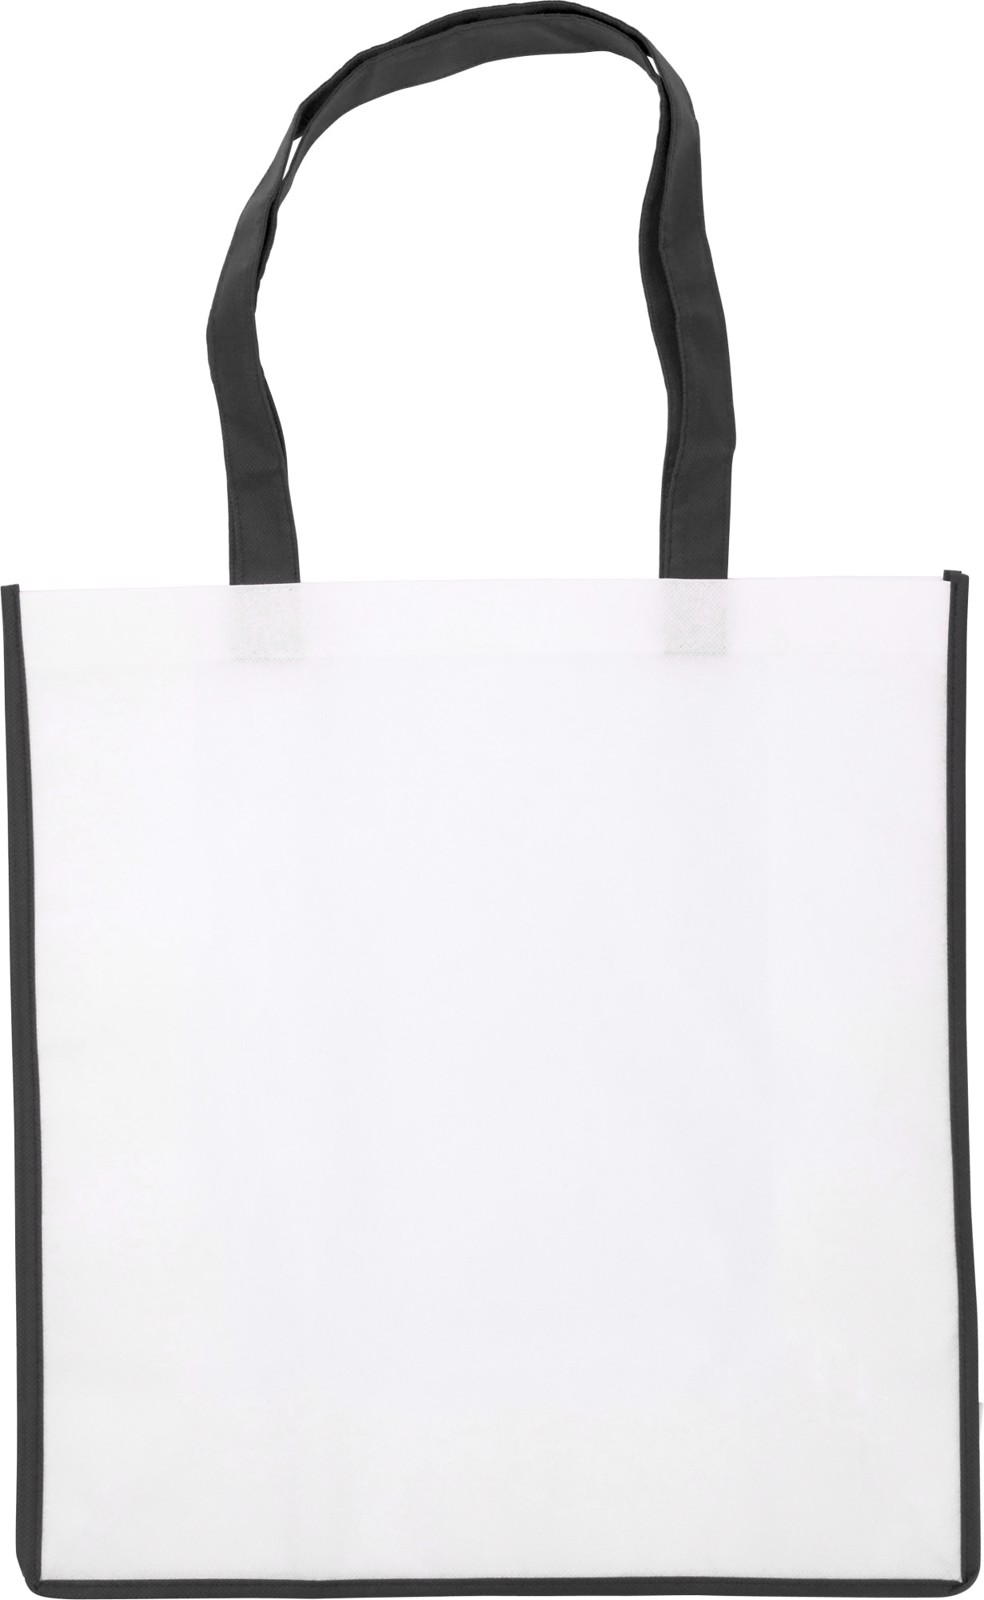 Nonwoven (80 gr/m²) bag - Black